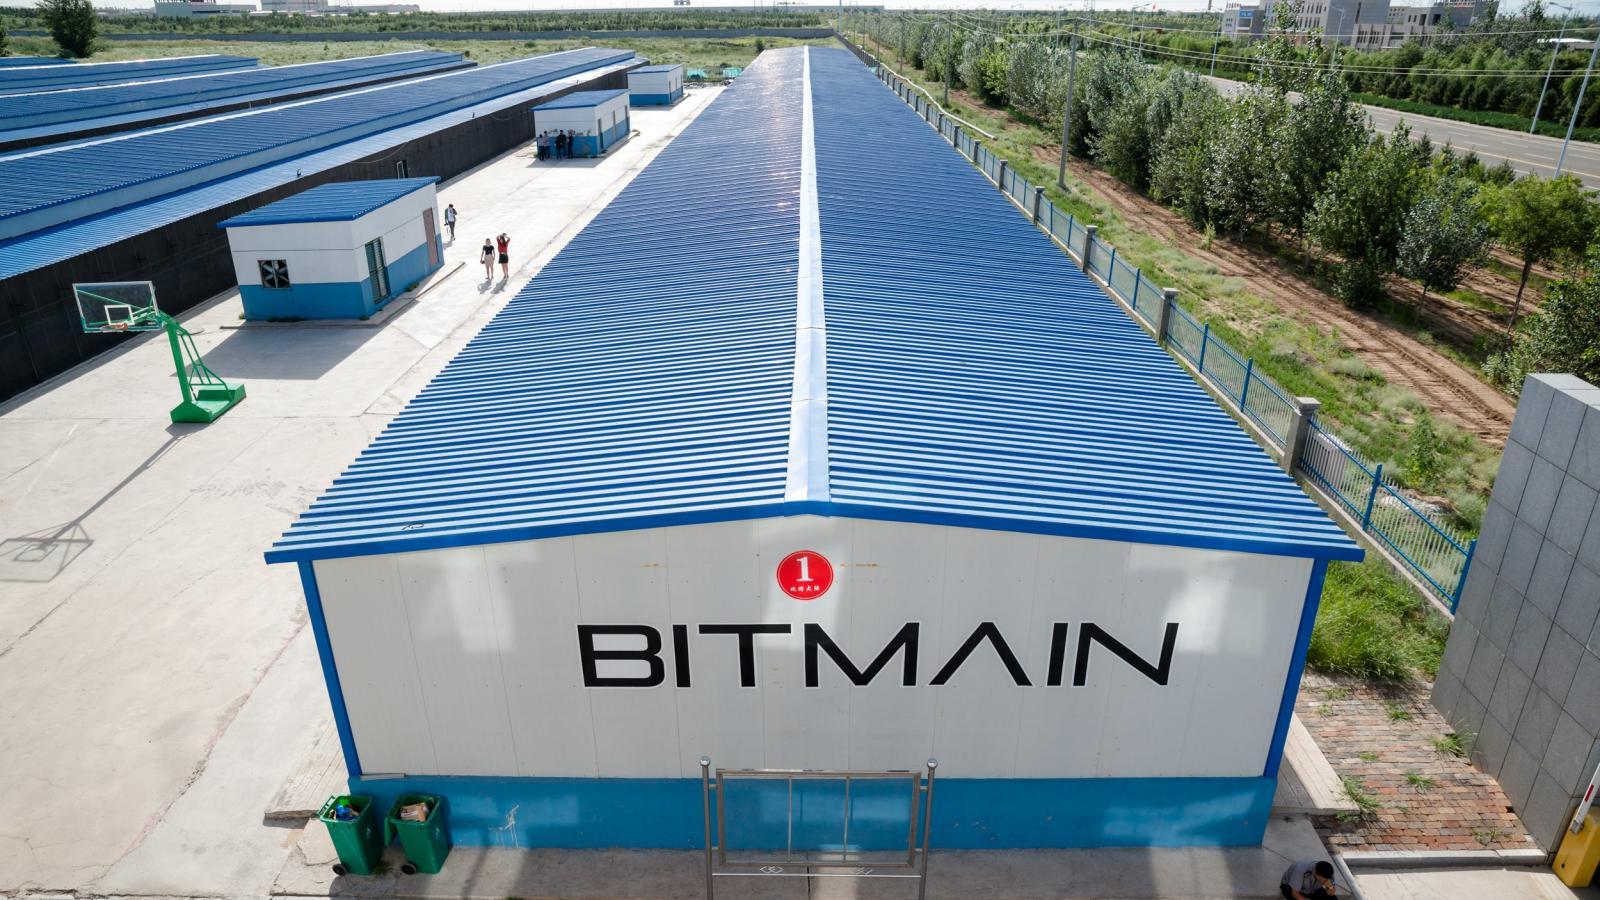 bitmain_941-e1502991601767.jpg